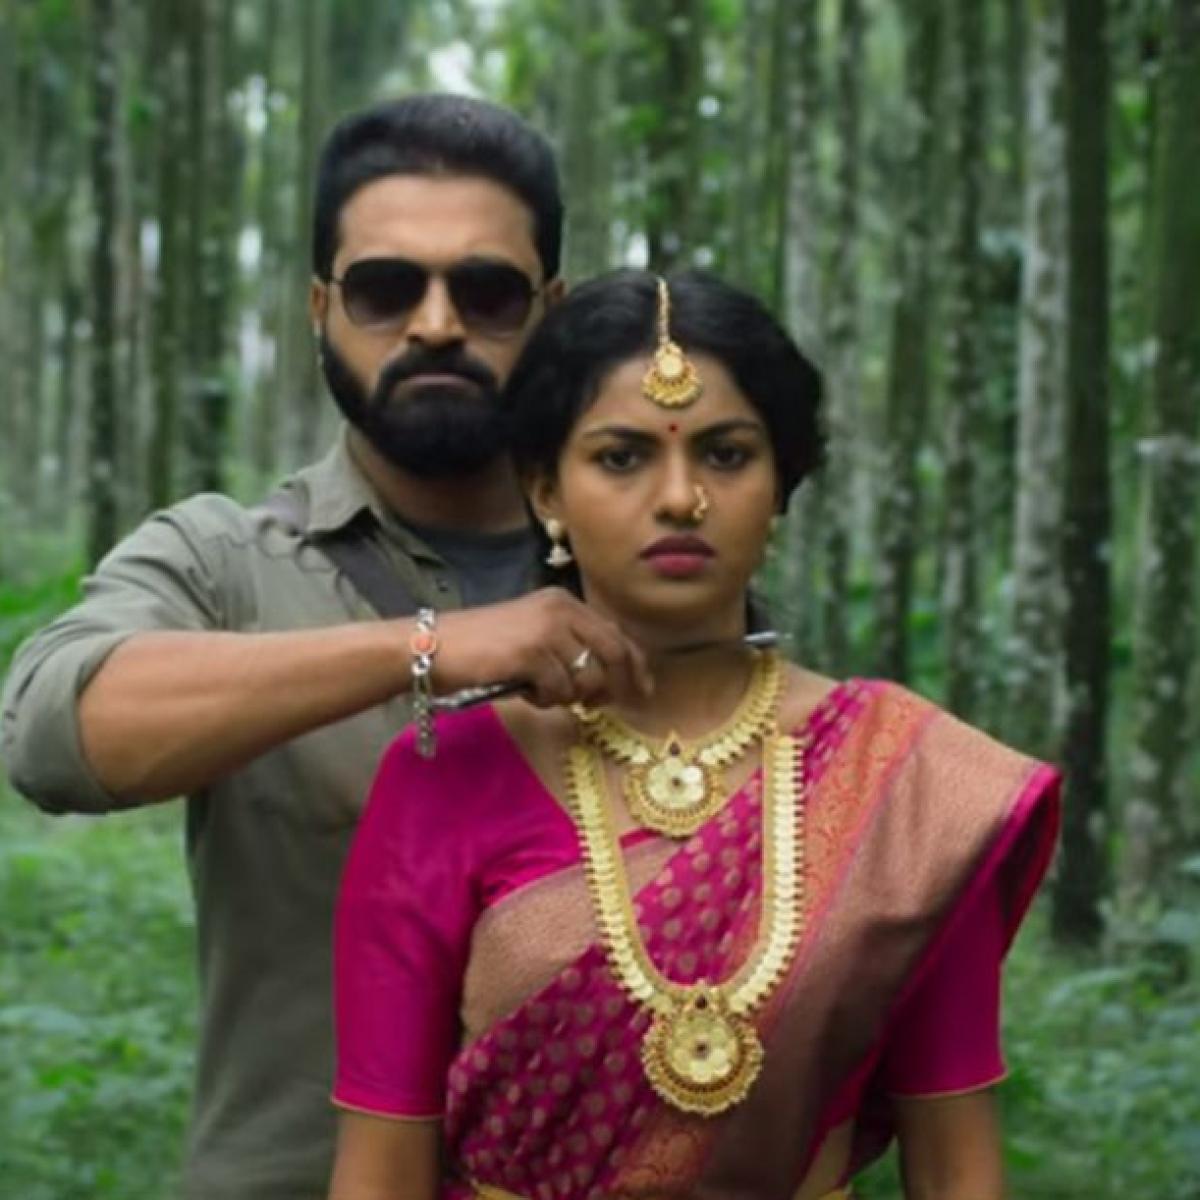 Watch: Bharath Raj's debut outing 'Hero' trailer starring Rishabh Shetty gains attention